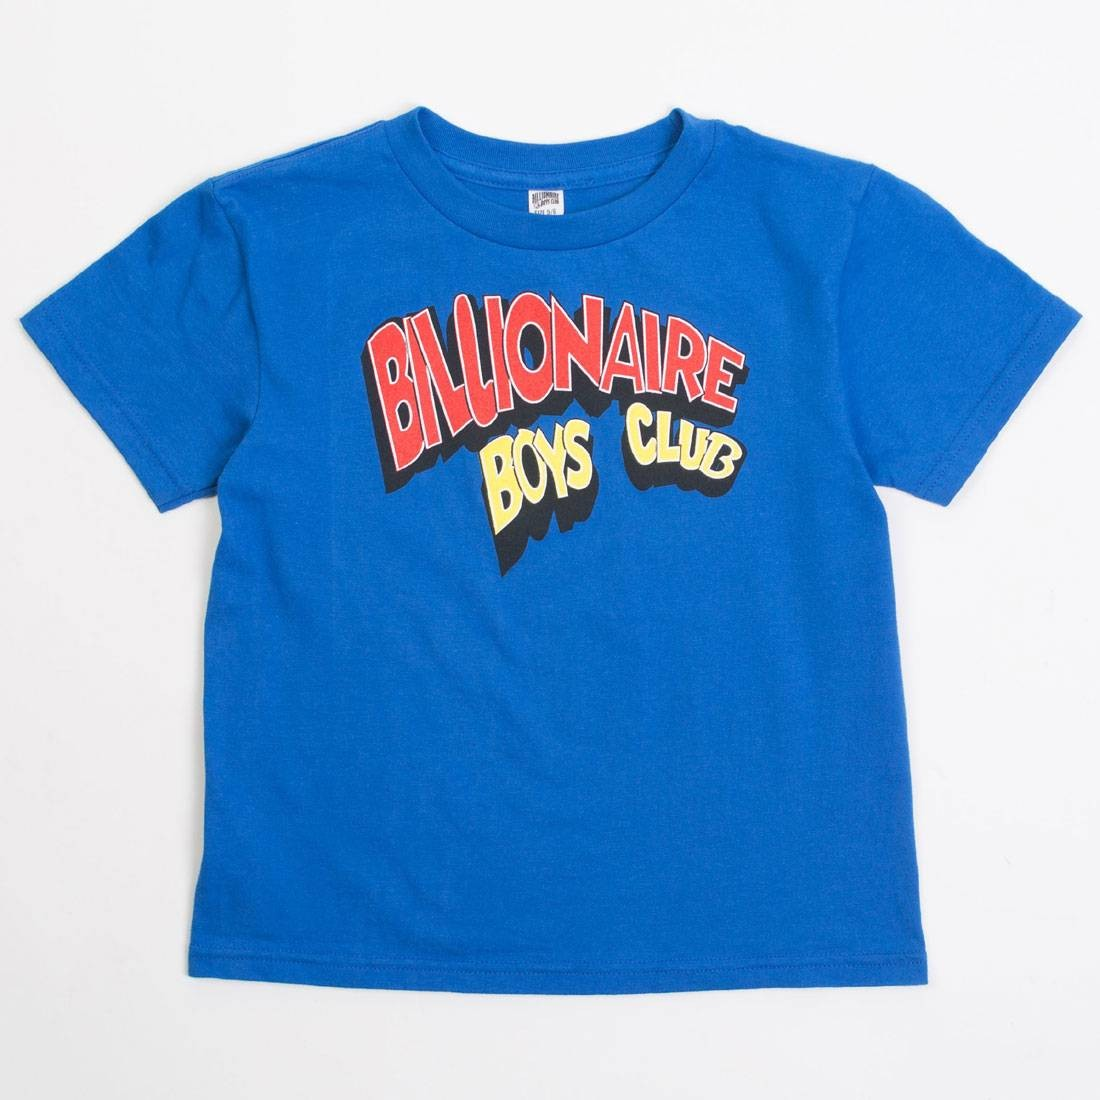 Billionaire Boys Club Youth Toons Tee (blue / royal)